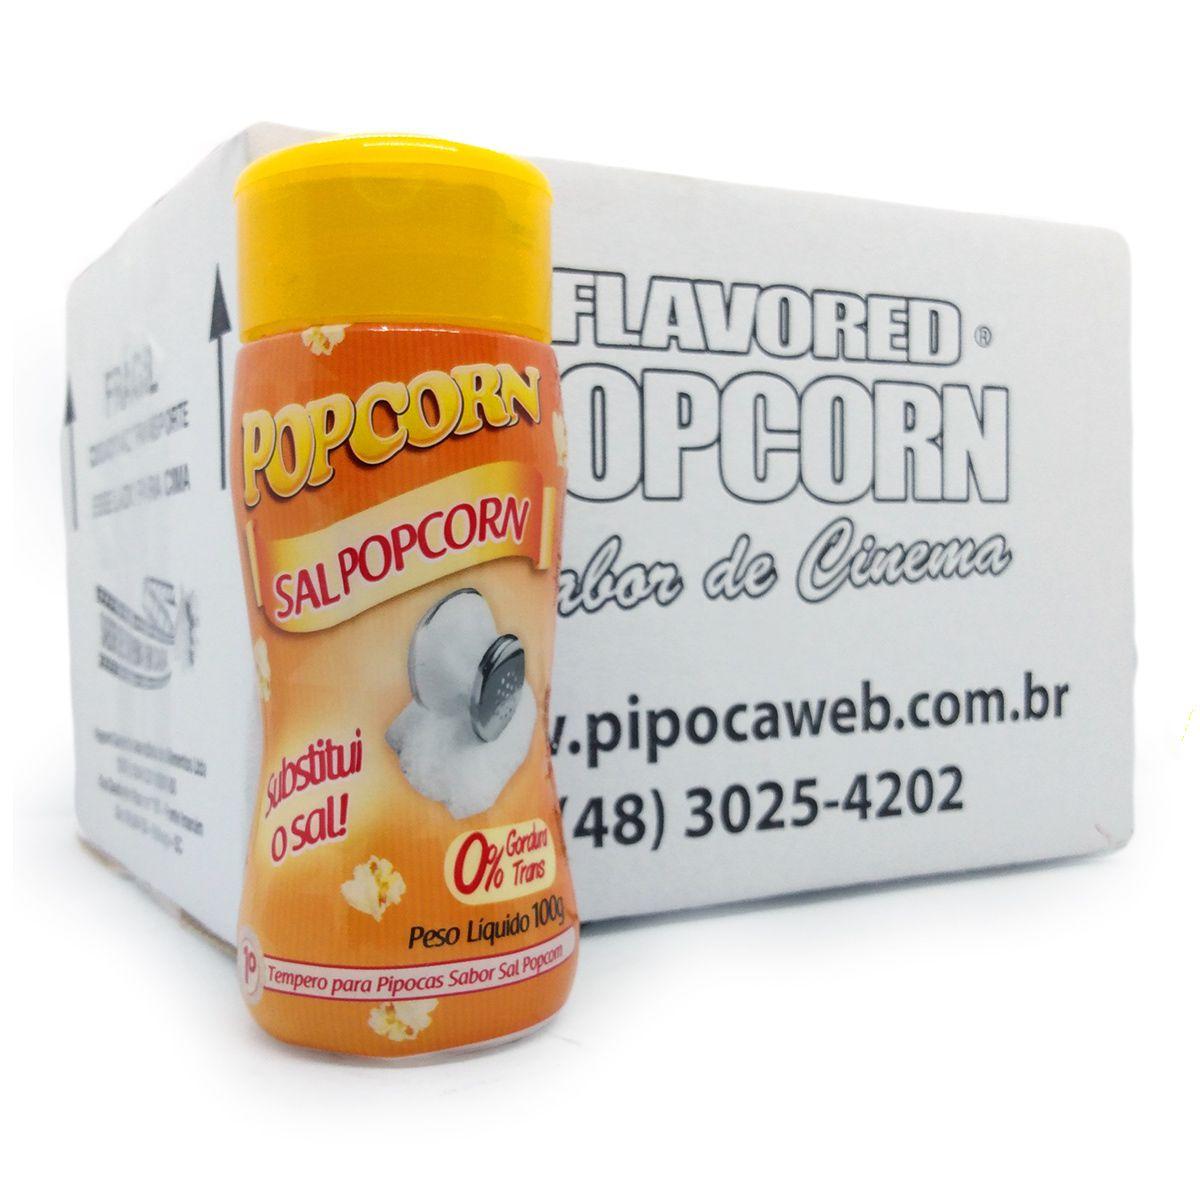 TEMPEROS P/ PIPOCA - SAL POPCORN 100g - Caixa c/ 12 Un - R$ 7,49 cada